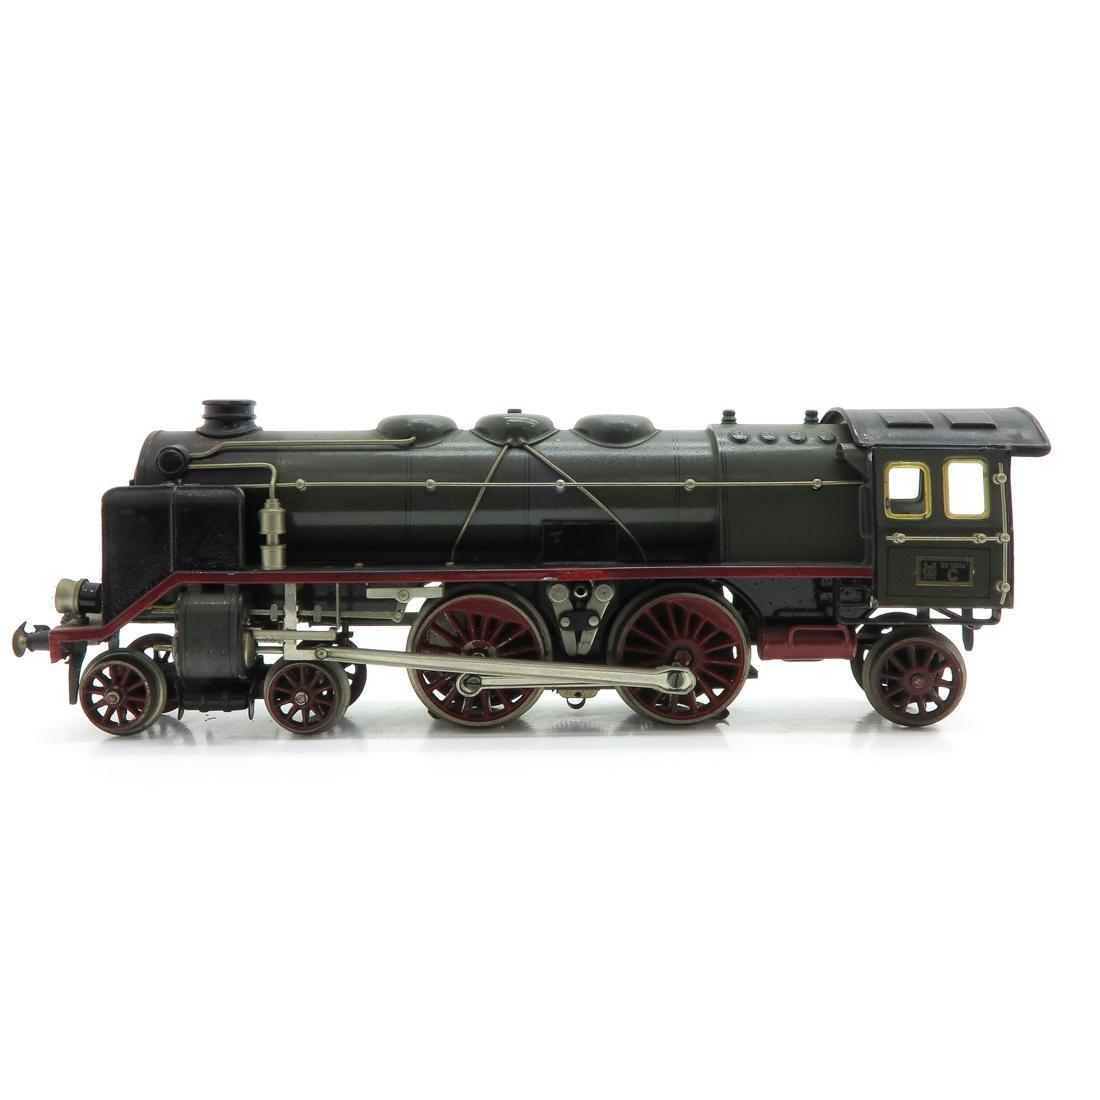 Vintage Marklin Locomotive